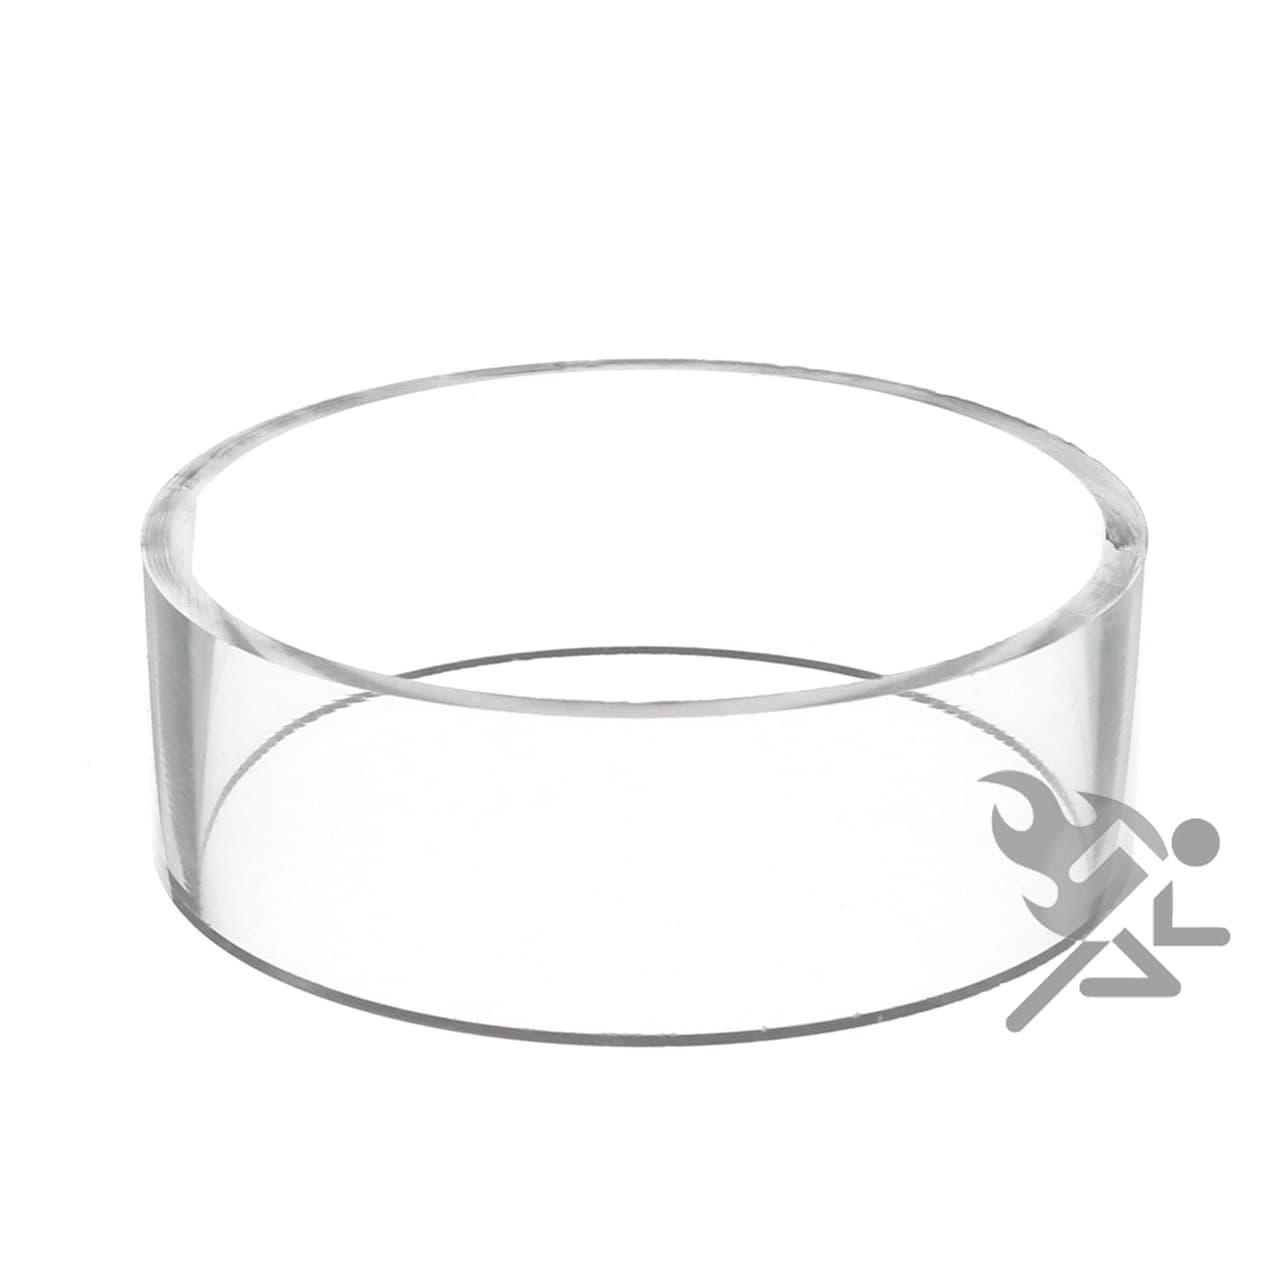 Acrylic Ring, 4″dia x 2″h